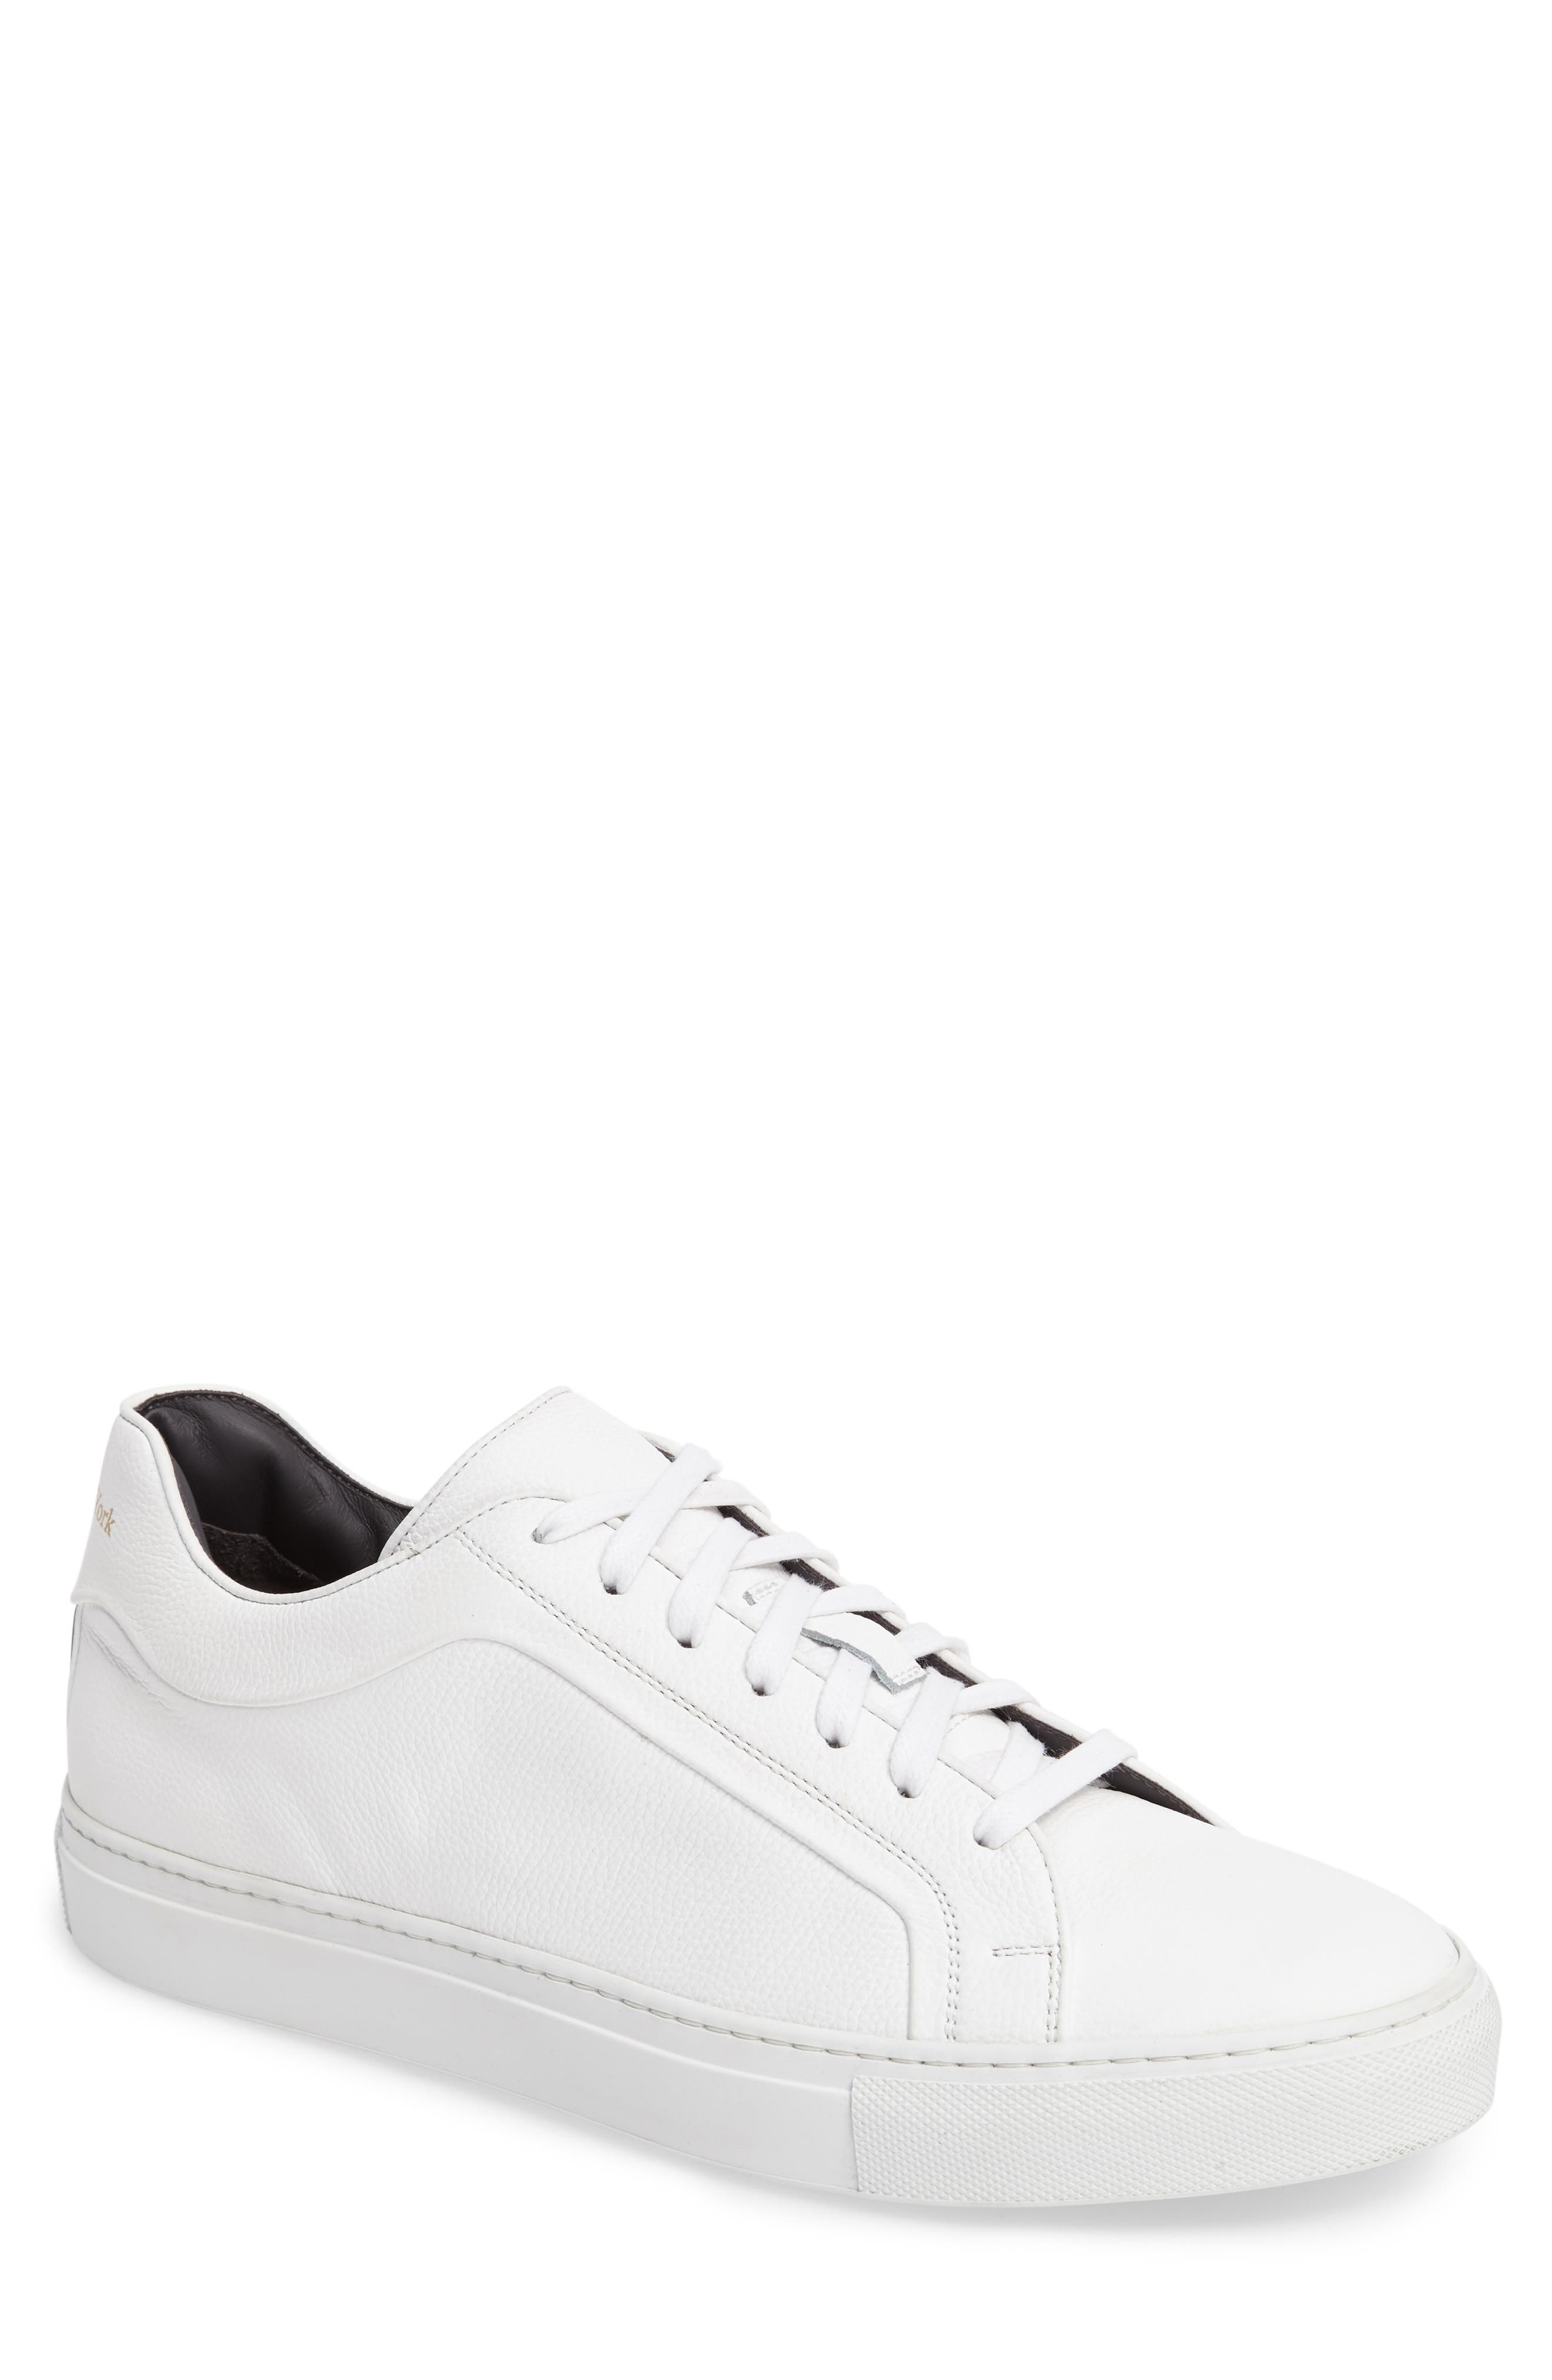 Main Image - To Boot New York Thomas Sneaker (Men)